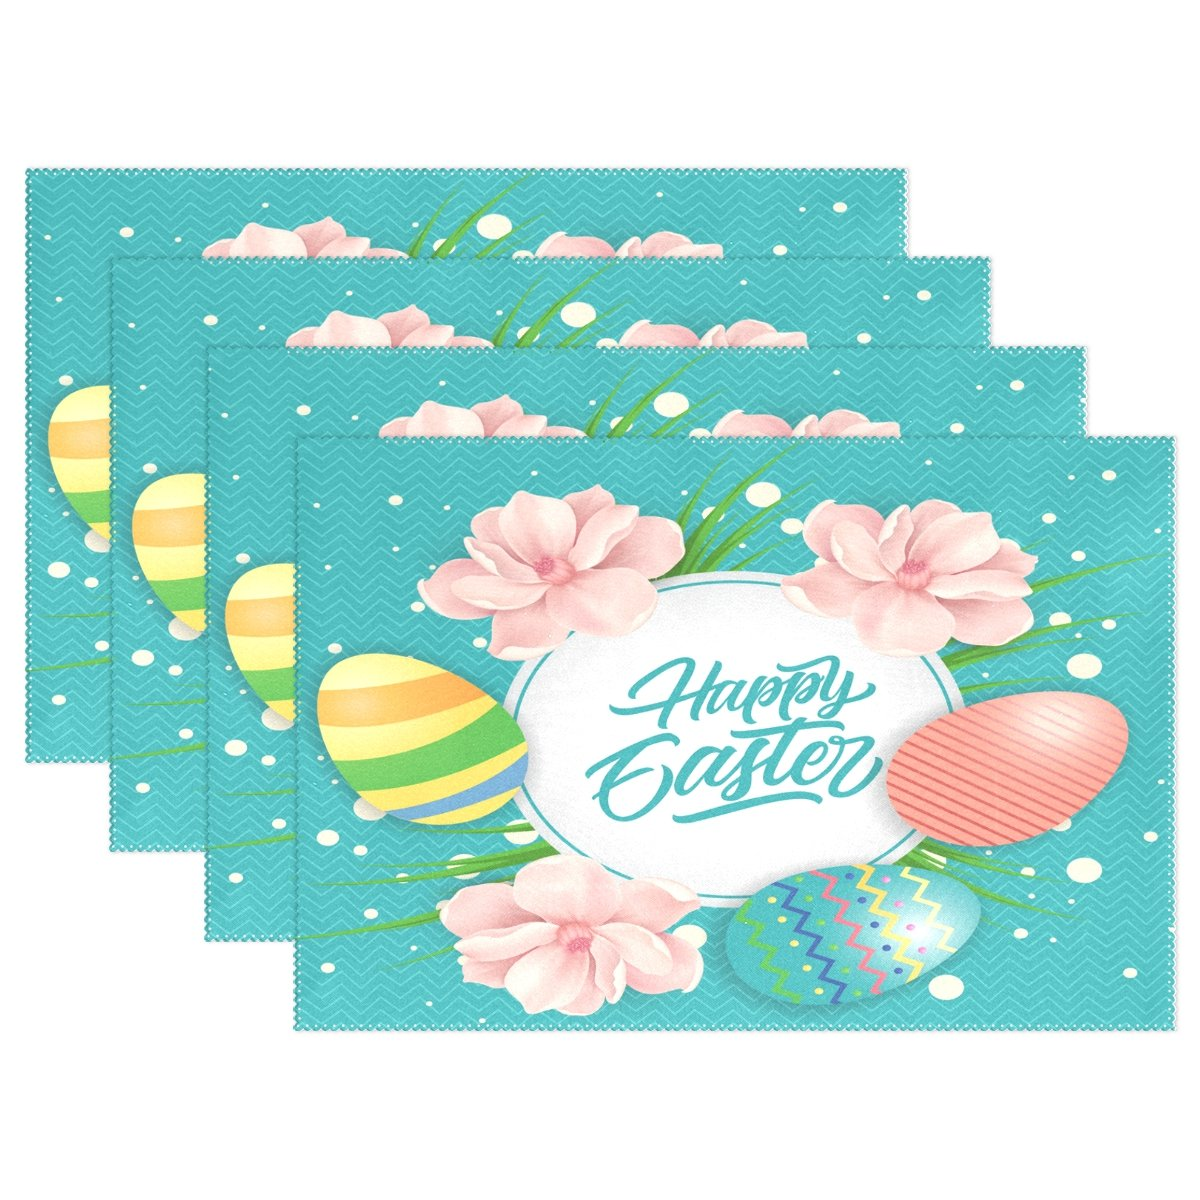 Alaza Happy Easter Eggs And Flowers Placematプレートホルダーのセット1、ポリエステルテーブルの配置マットプロテクターキッチンダイニングルーム12